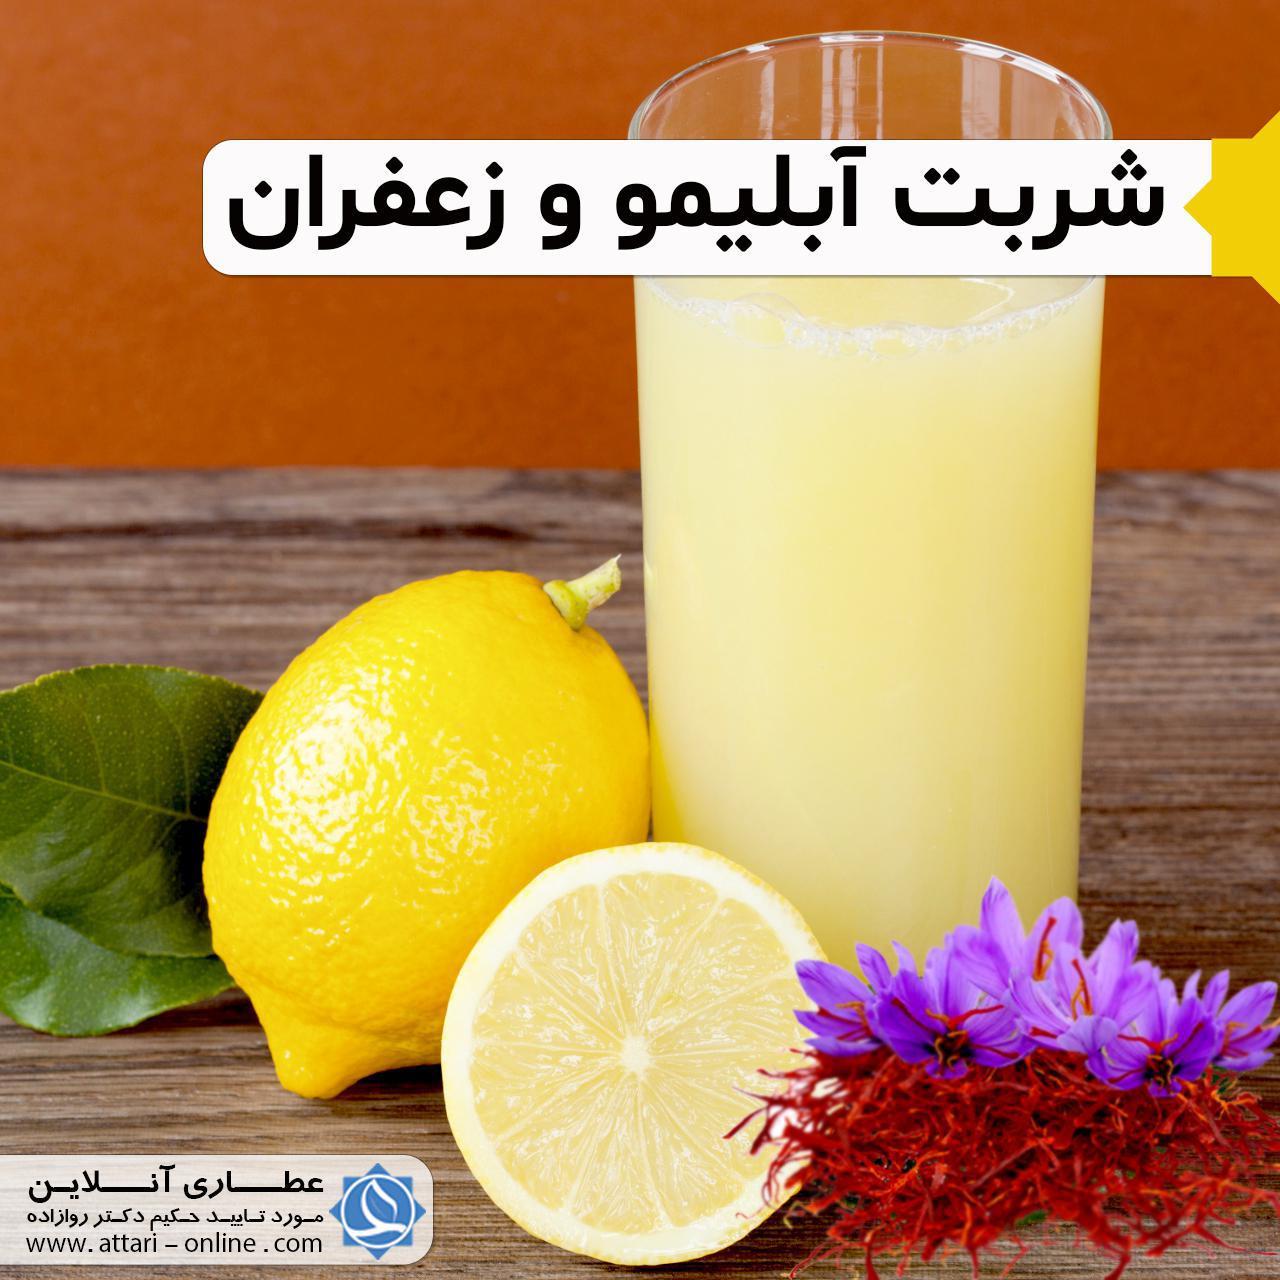 ش ب9 شربت زعفران و آبلیمو